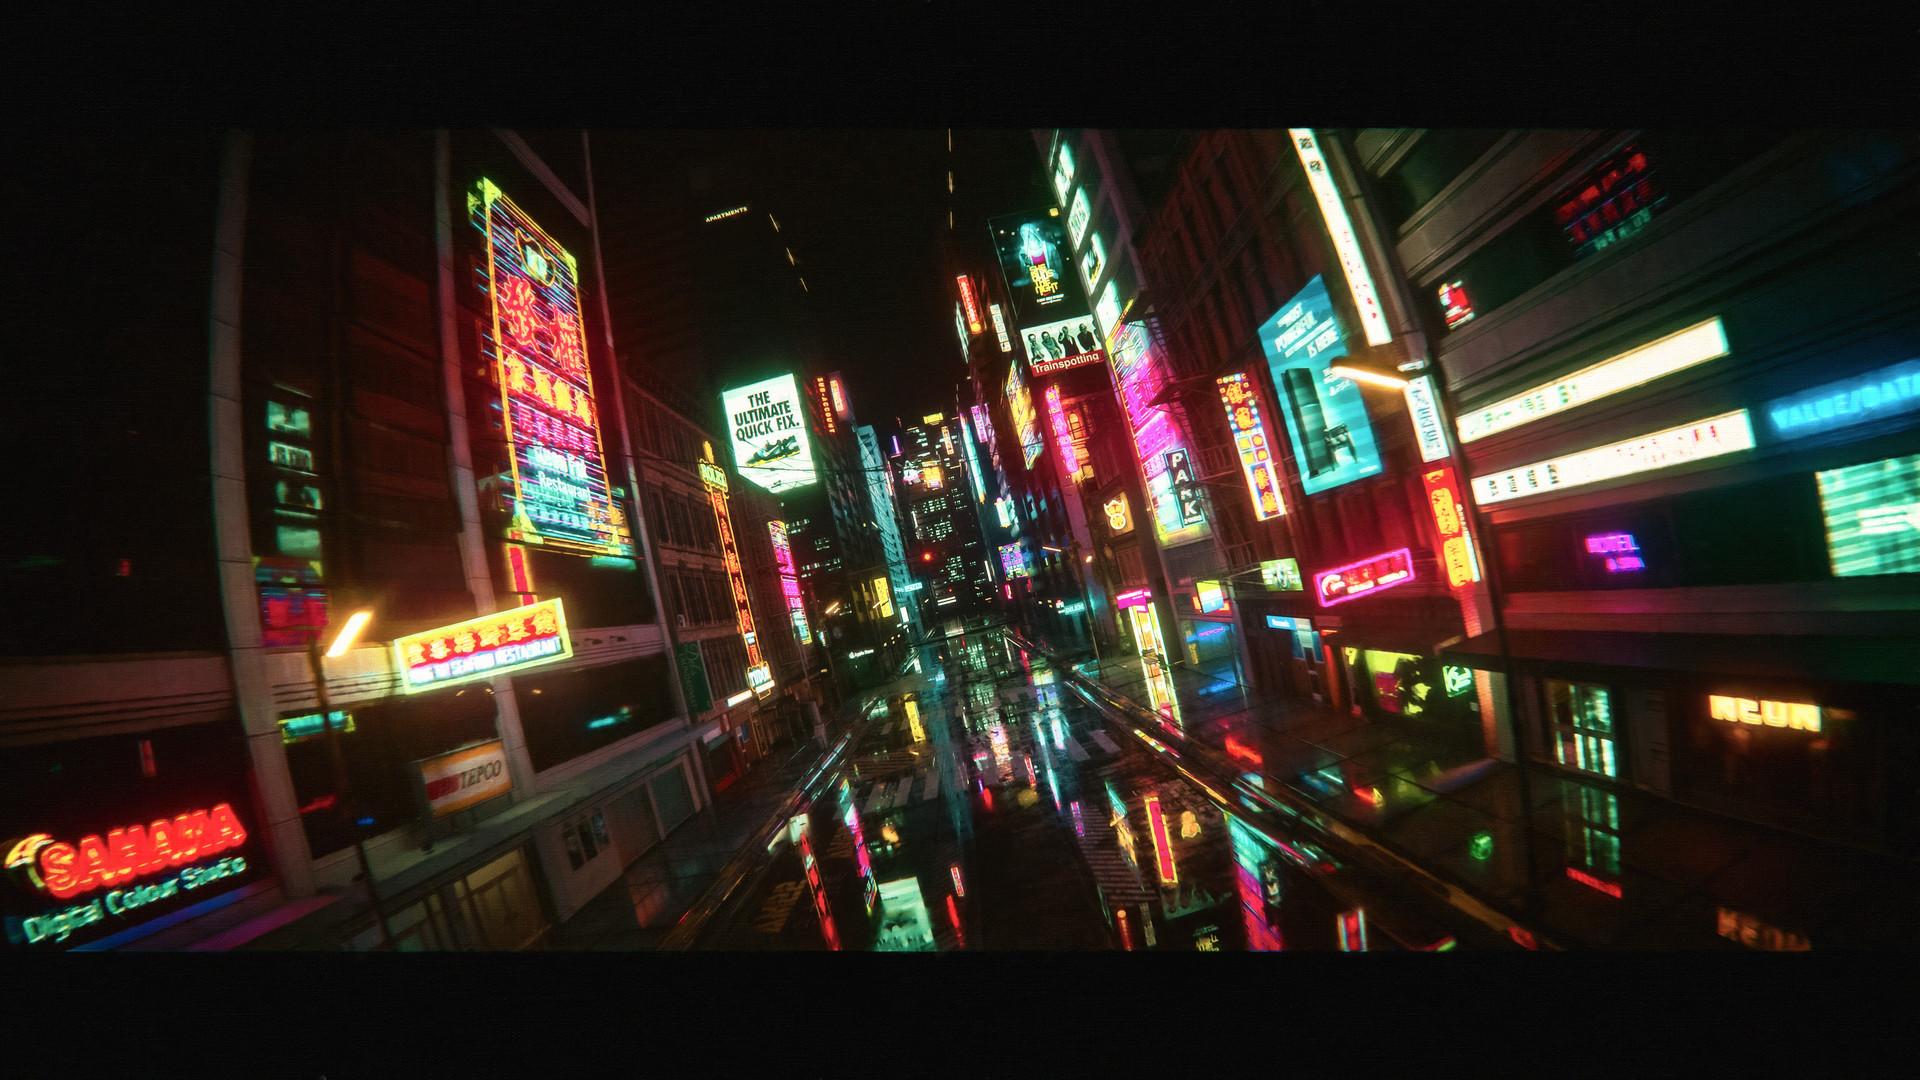 Wallpaper : neon, city, street 1920x1080 - zod000 ...